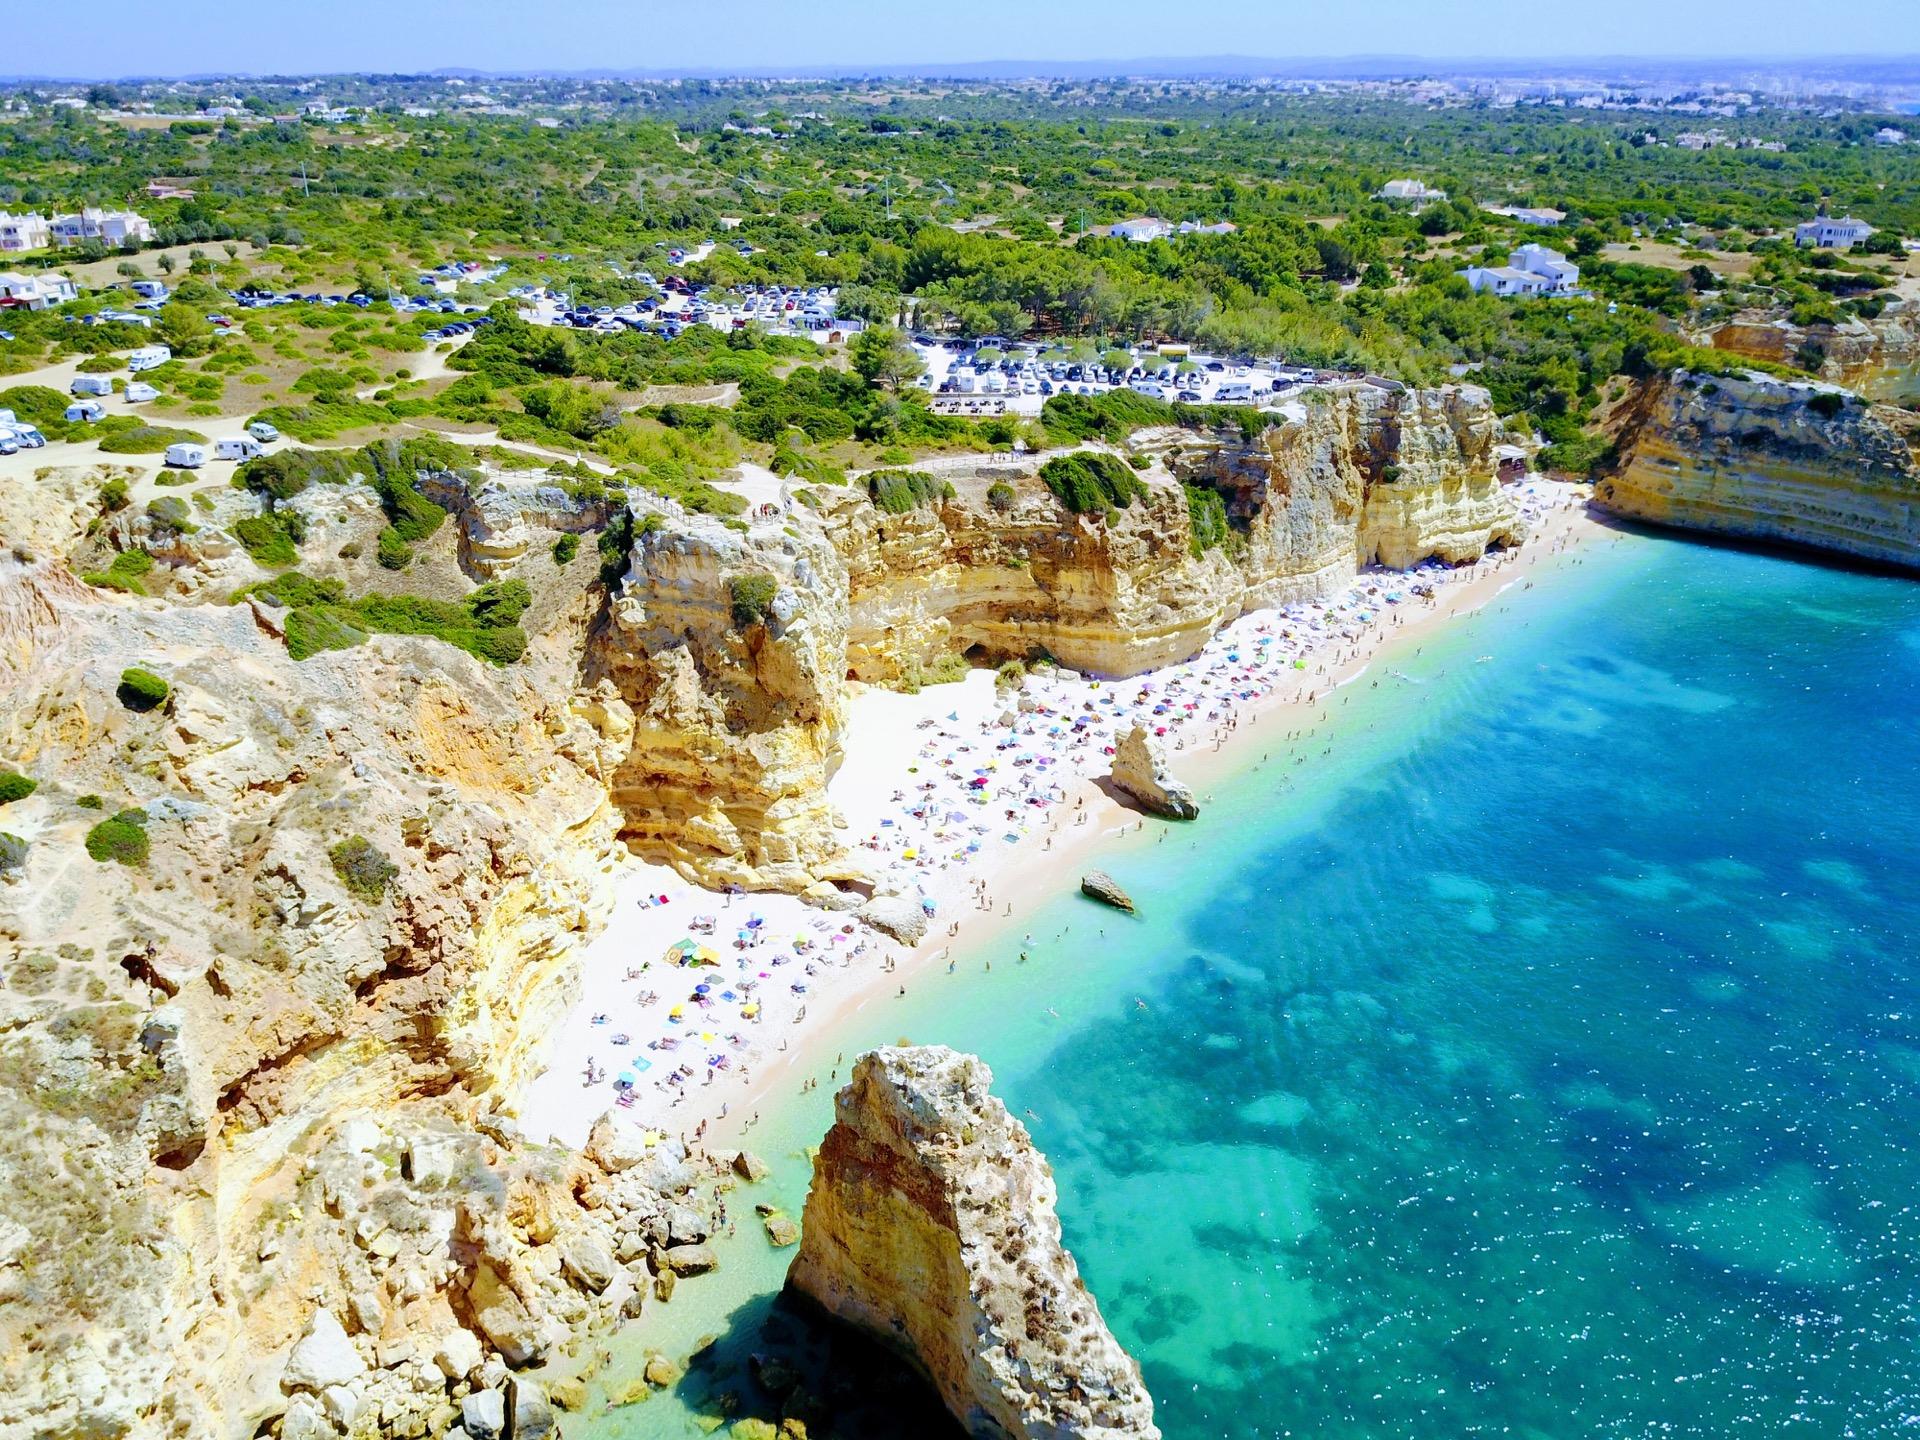 Looking down at Praia Marina, Algarve, Portugal